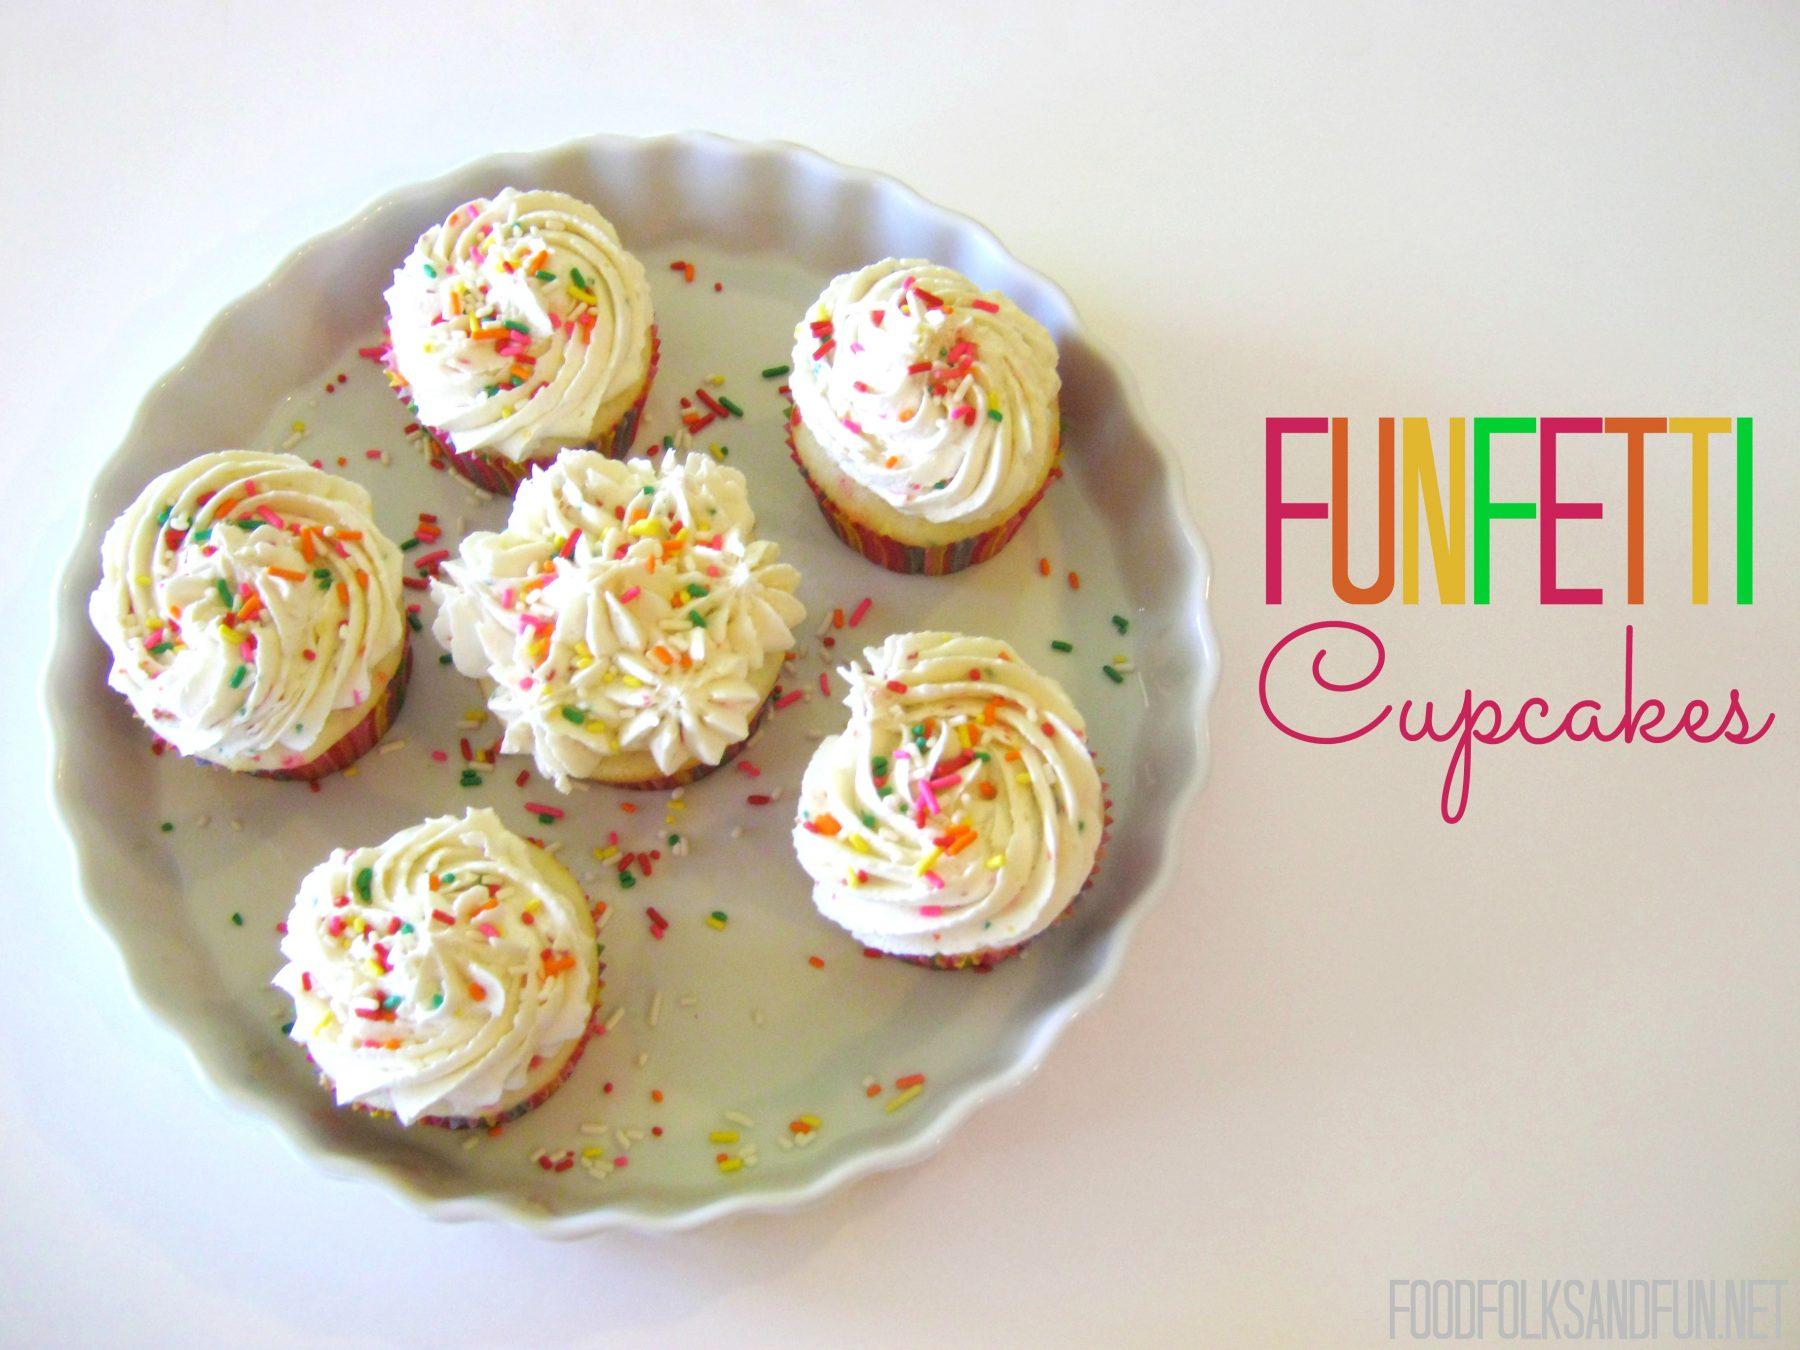 Funfetti Cupcakes & a Little Announcement